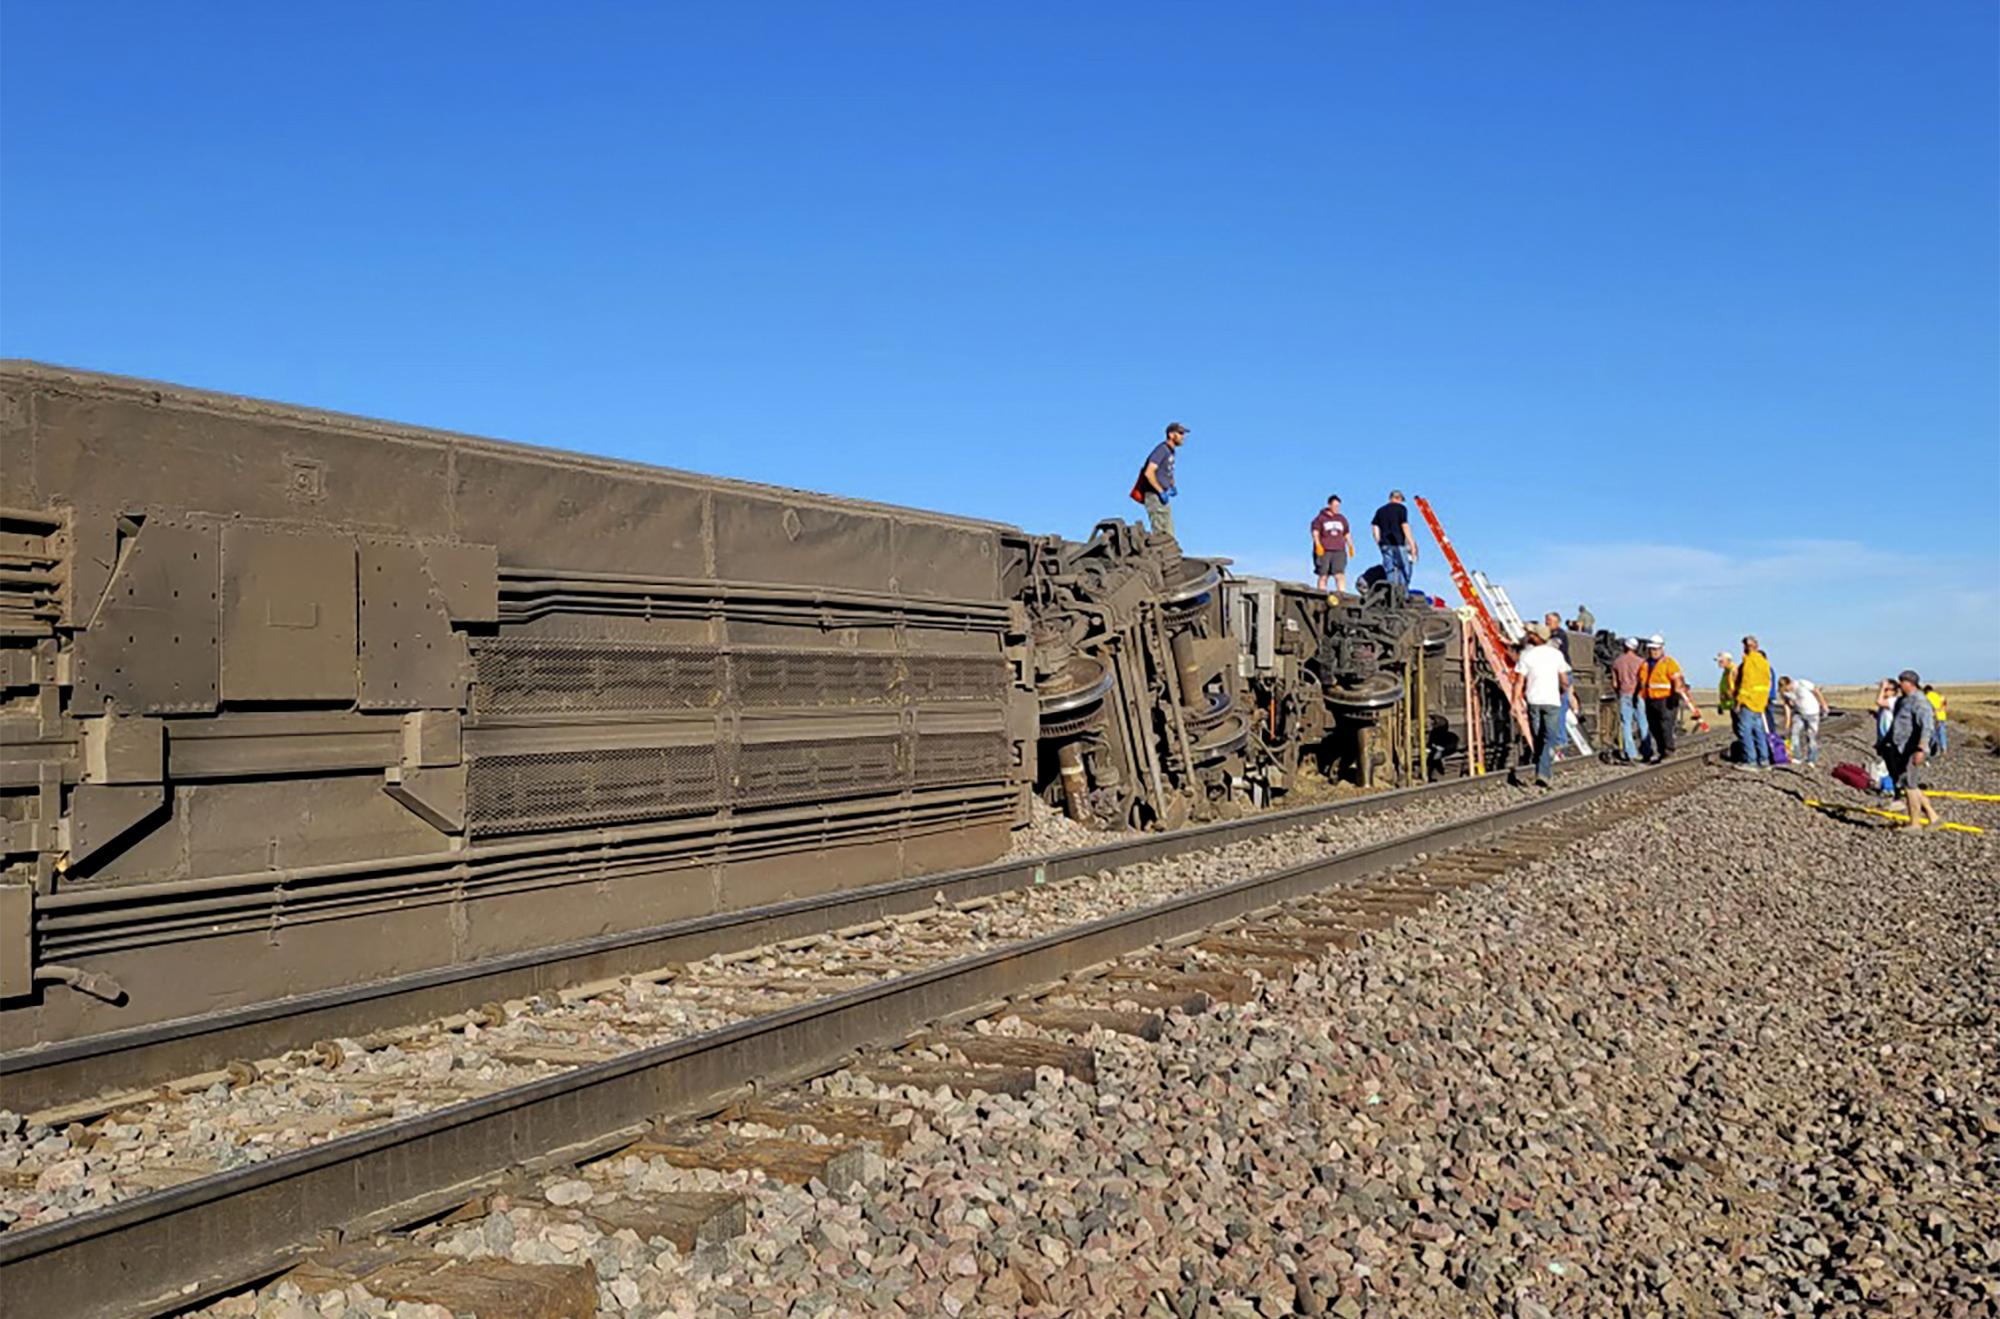 At least 3 dead, dozens injured after Amtrak train derails in Montana